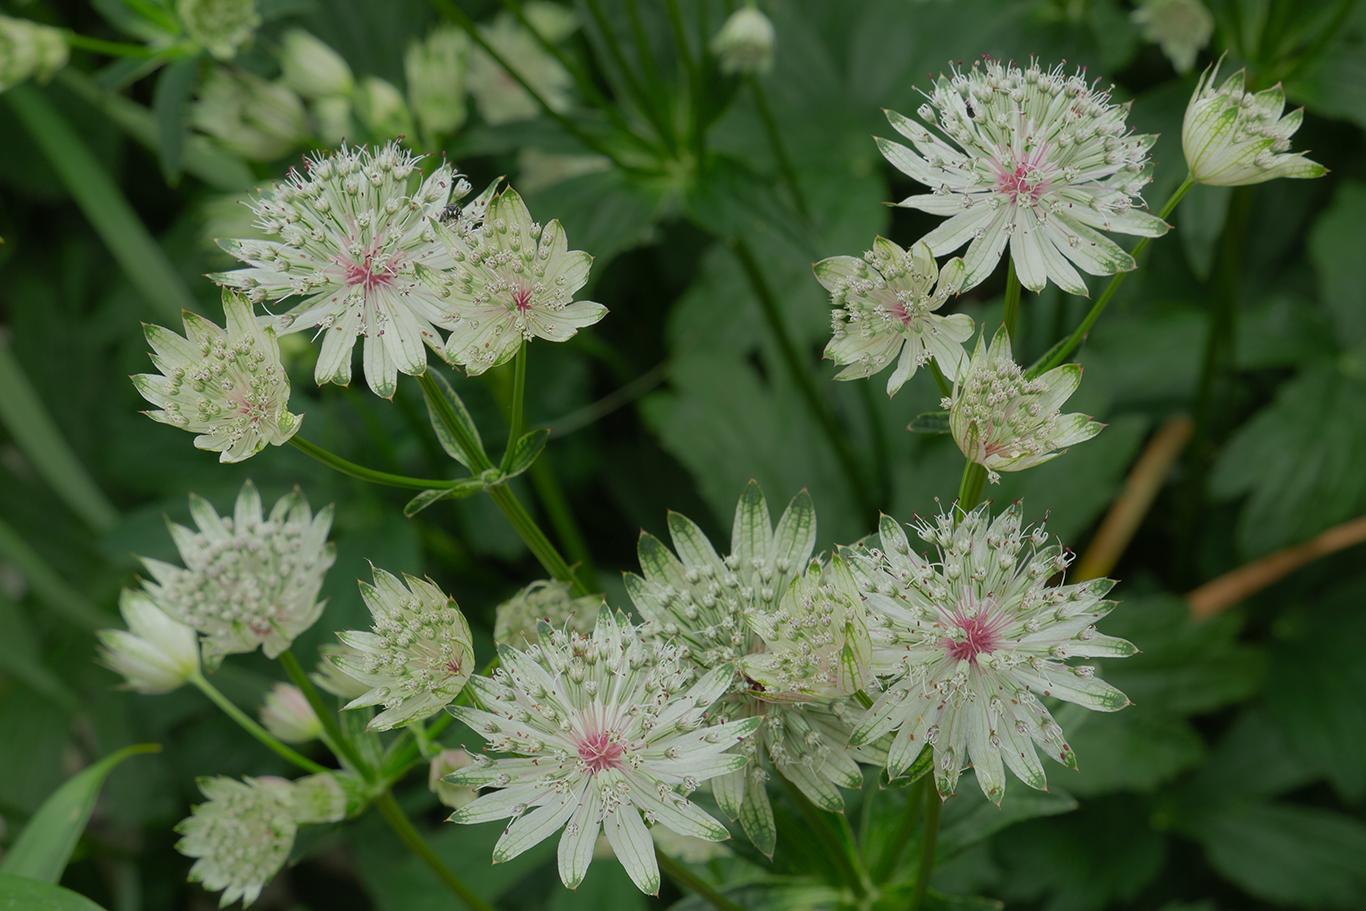 Astrantia bloom (1 of 1)